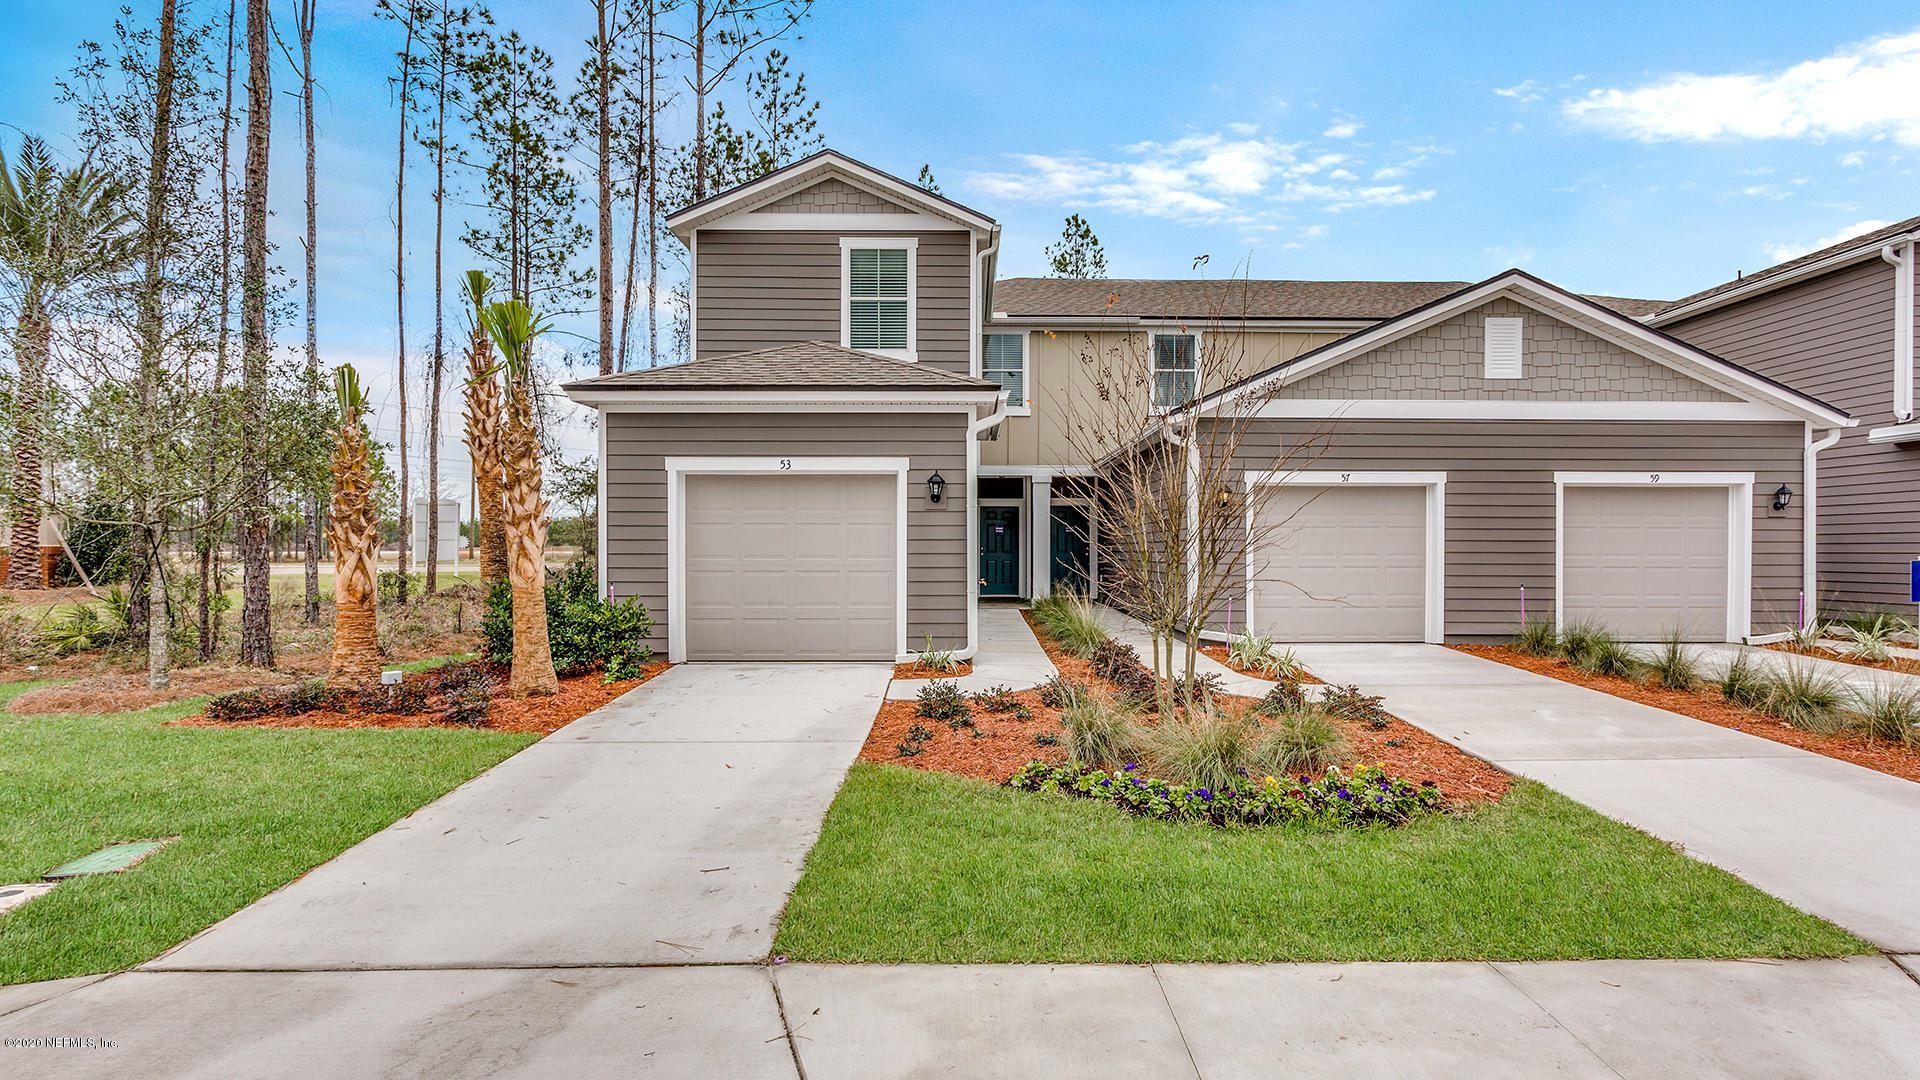 432 ARALIA LN #Lot No: 111, Jacksonville, FL 32216 - MLS#: 1098956